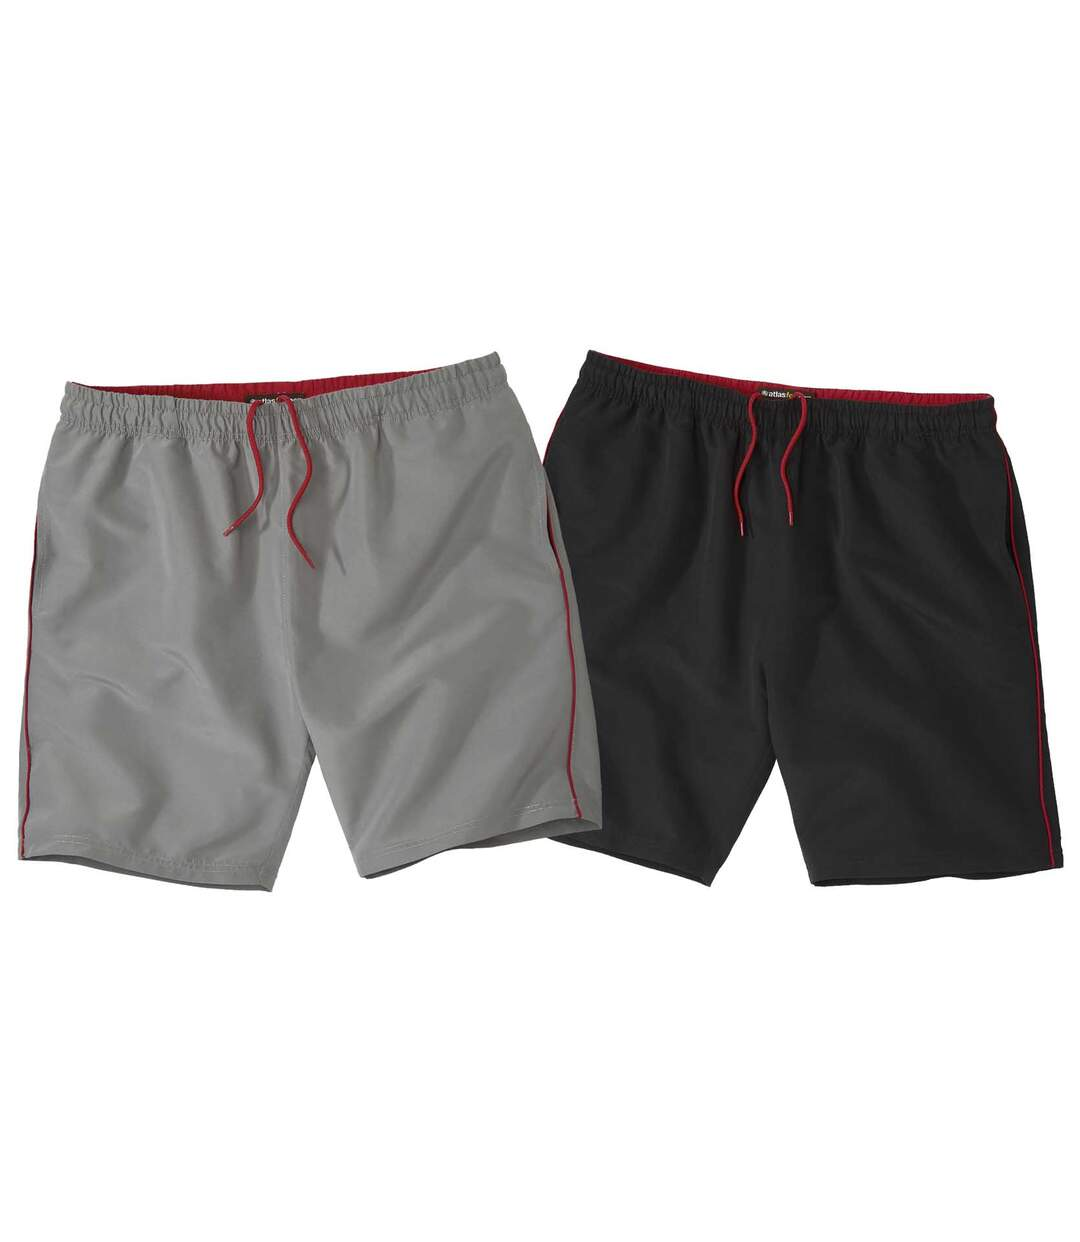 Sada 2 šortek Sunny Sport z mikrovlákna